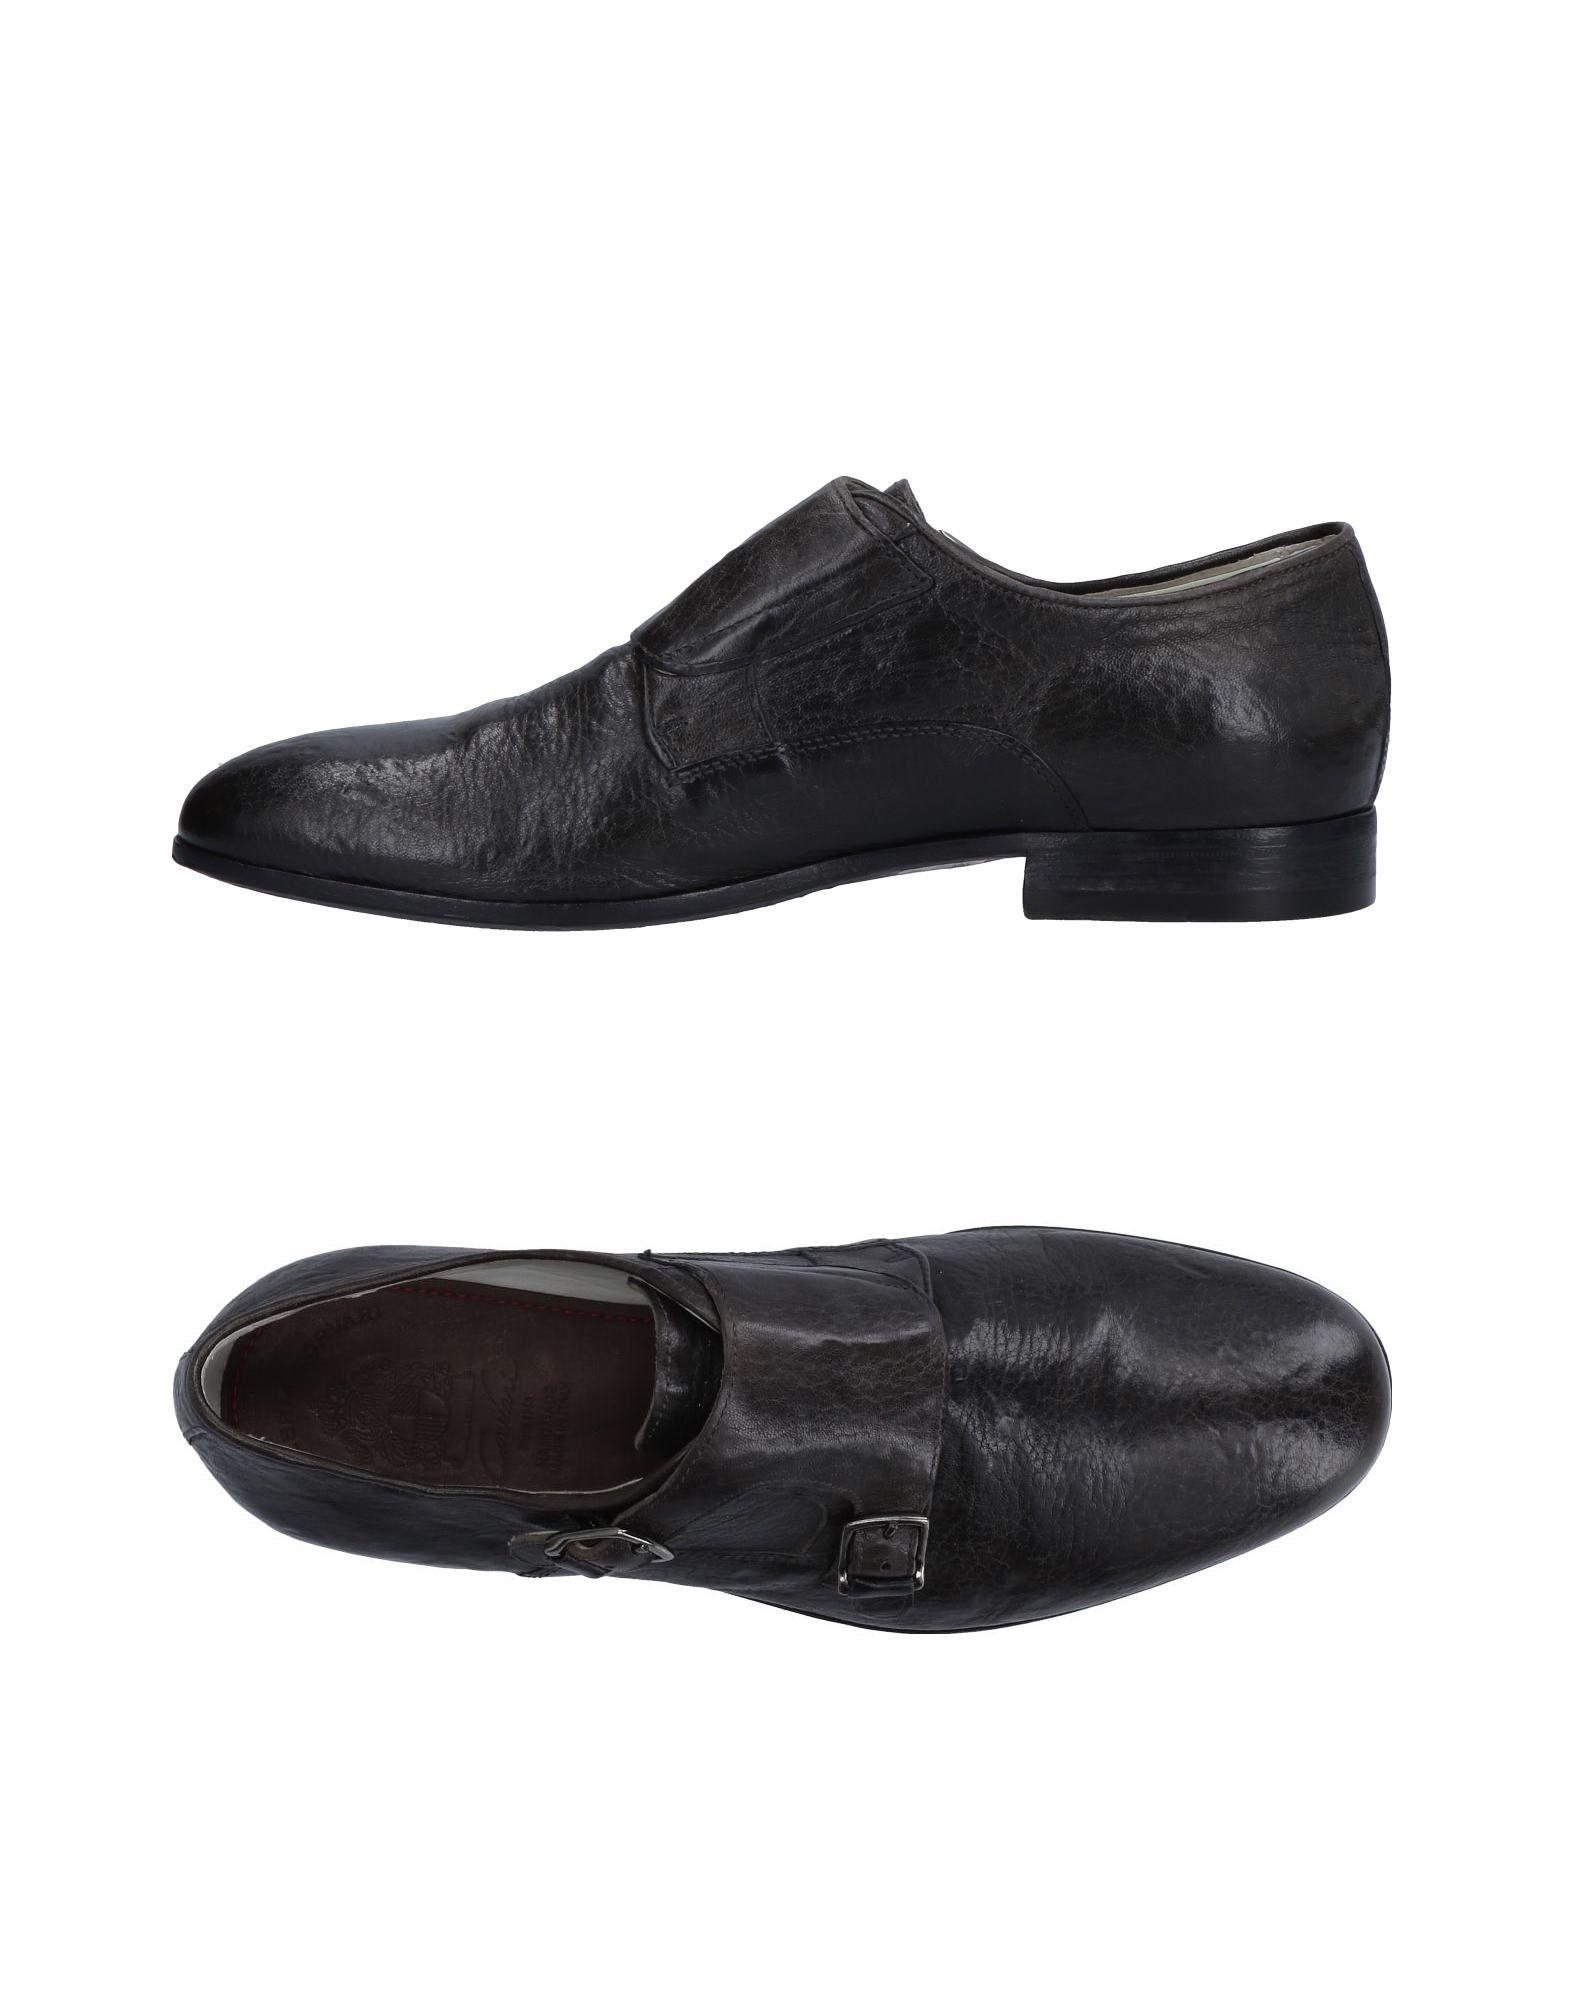 Corvari Mokassins Herren  11173847XL Gute Qualität beliebte Schuhe